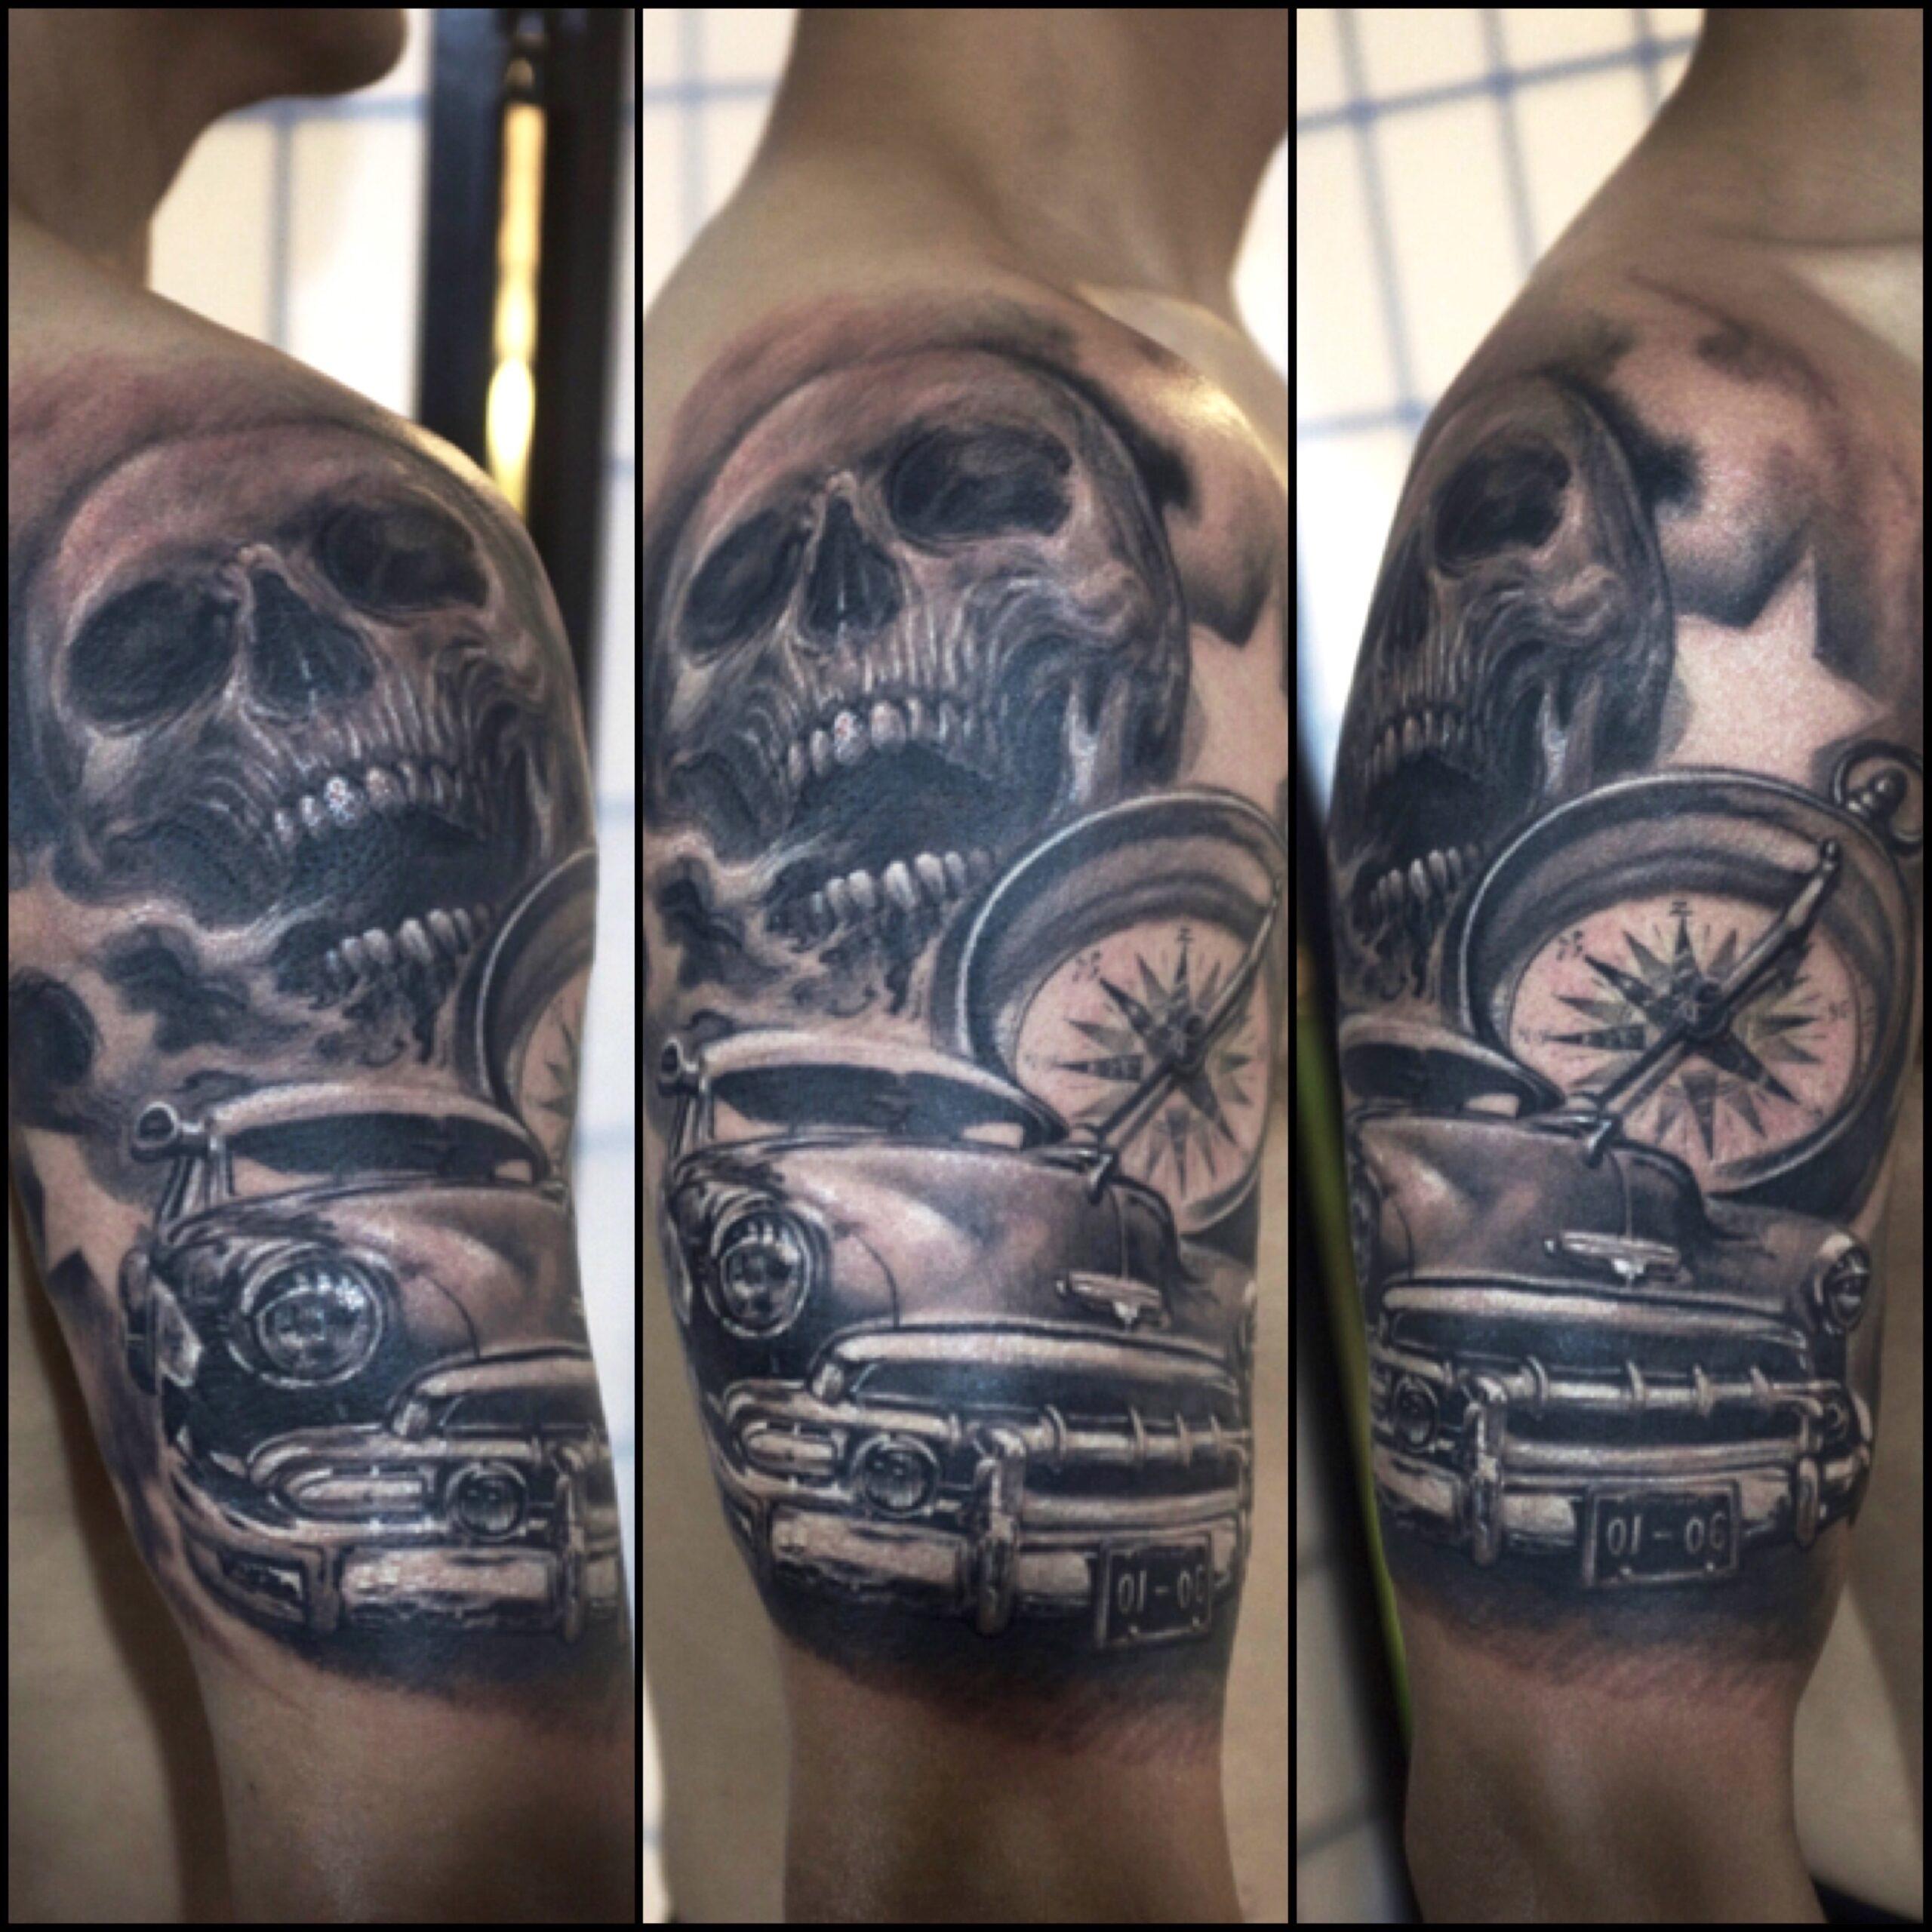 zhuo dan ting tattoo work 卓丹婷纹身作品 机车骷髅指南针纹身 1